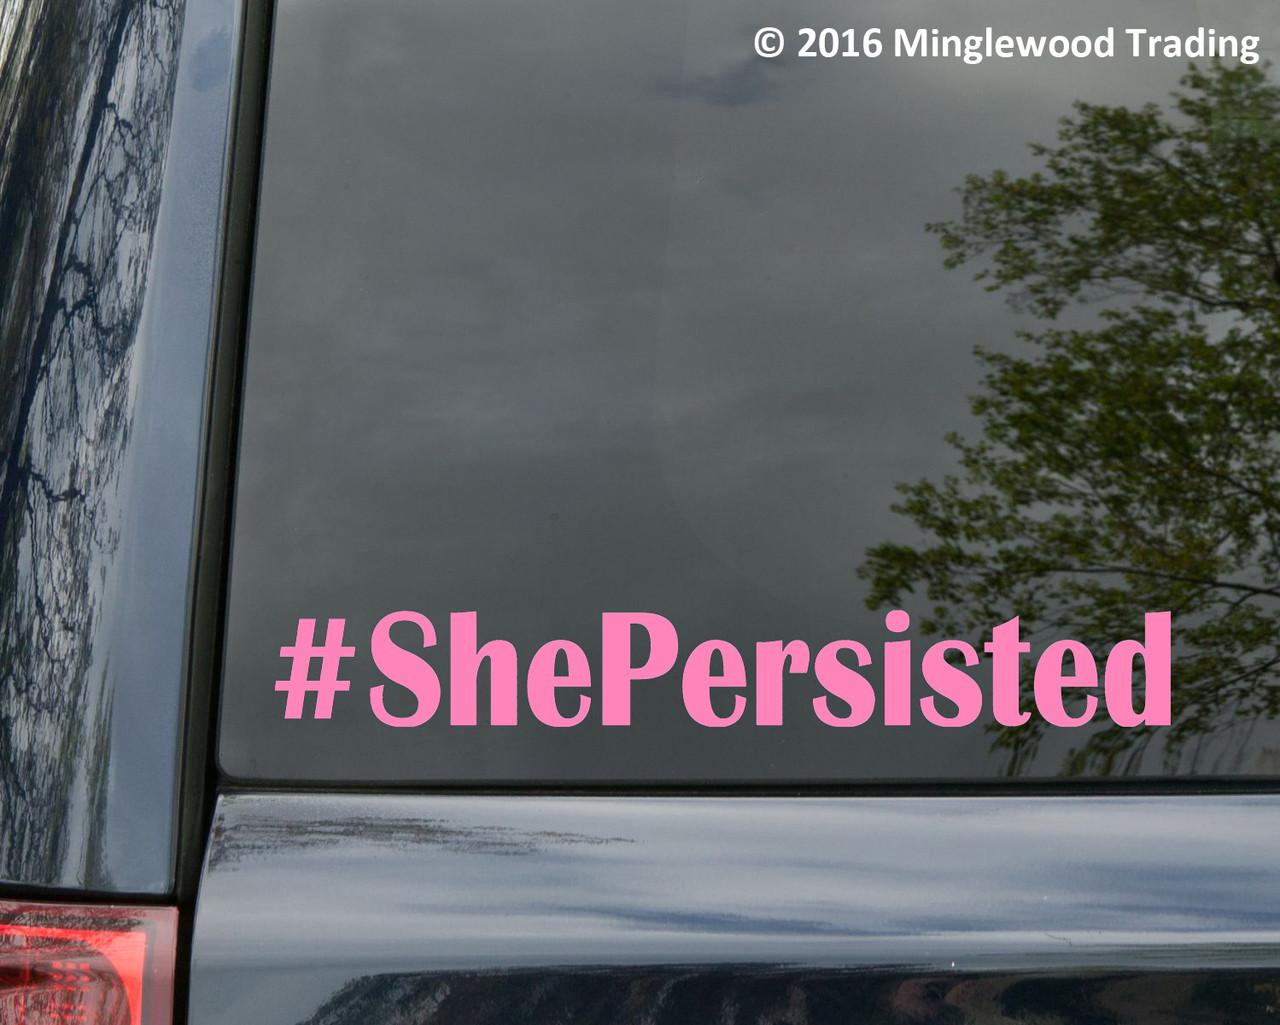 "#ShePersisted Vinyl Decal Sticker 11"" x 1.5"" Elizabeth Warren Anti Trump Resist"